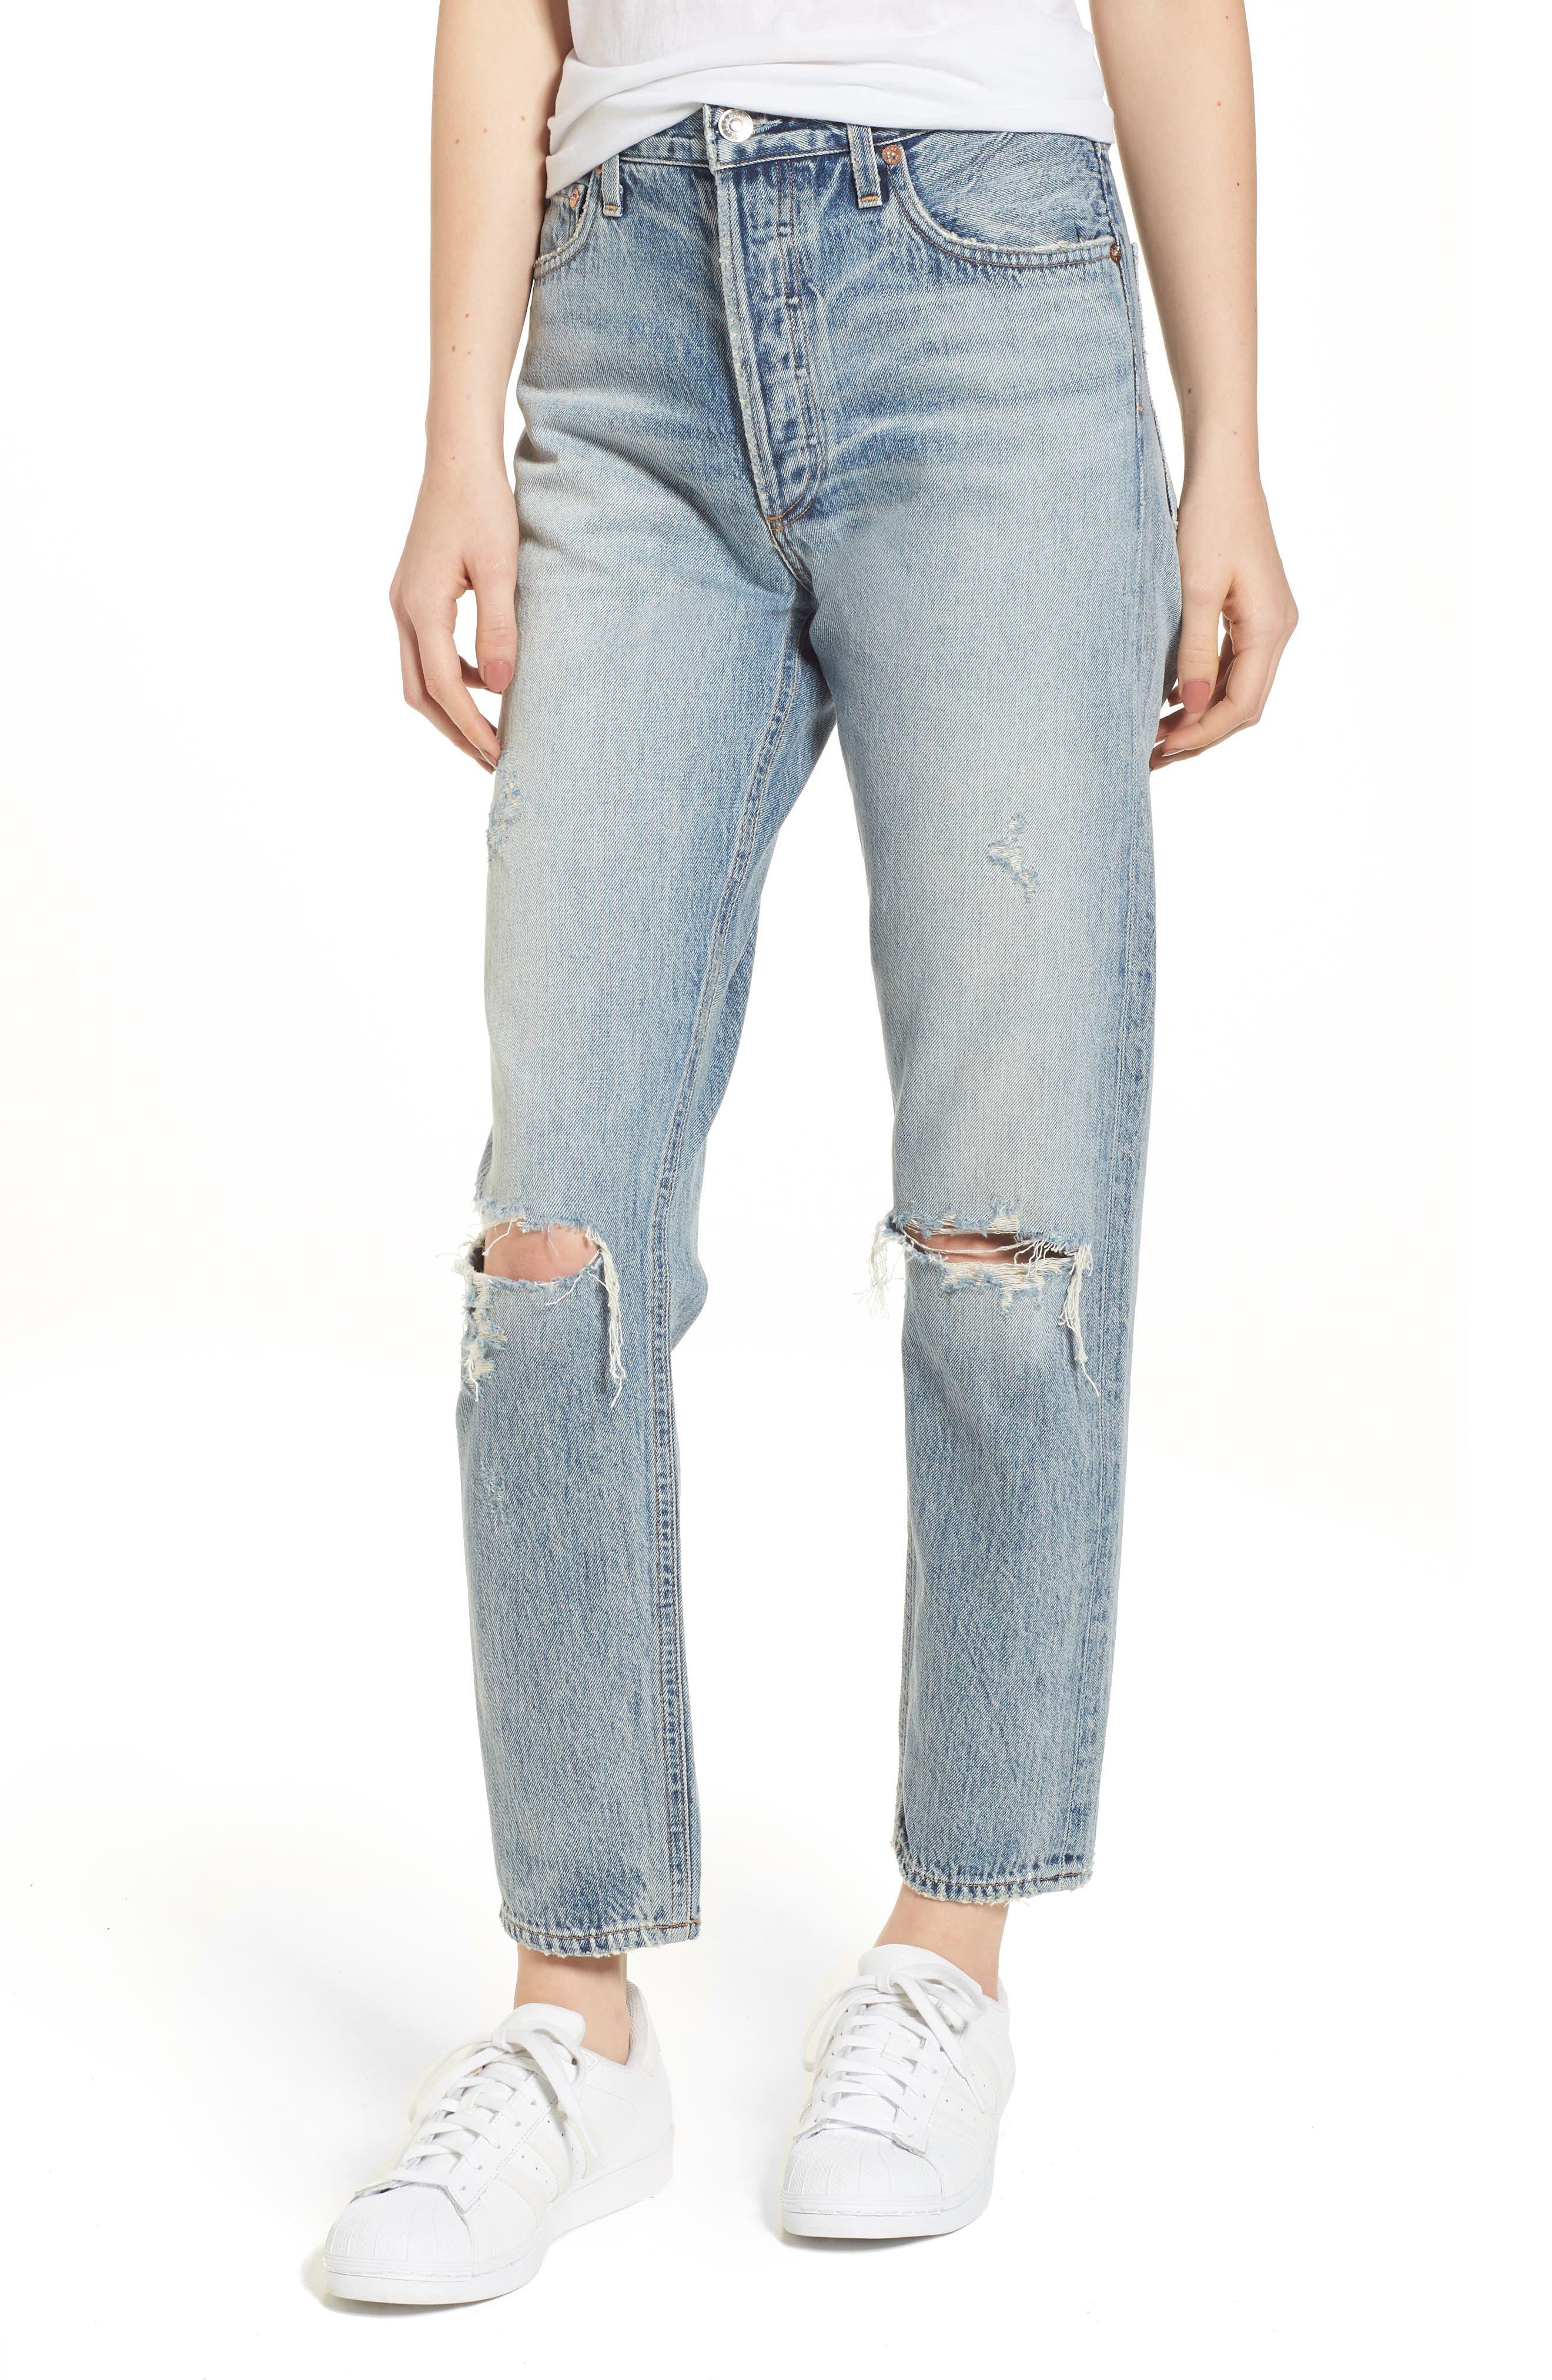 AGOLDE Jamie High Waist Ankle Jeans (Resolution)